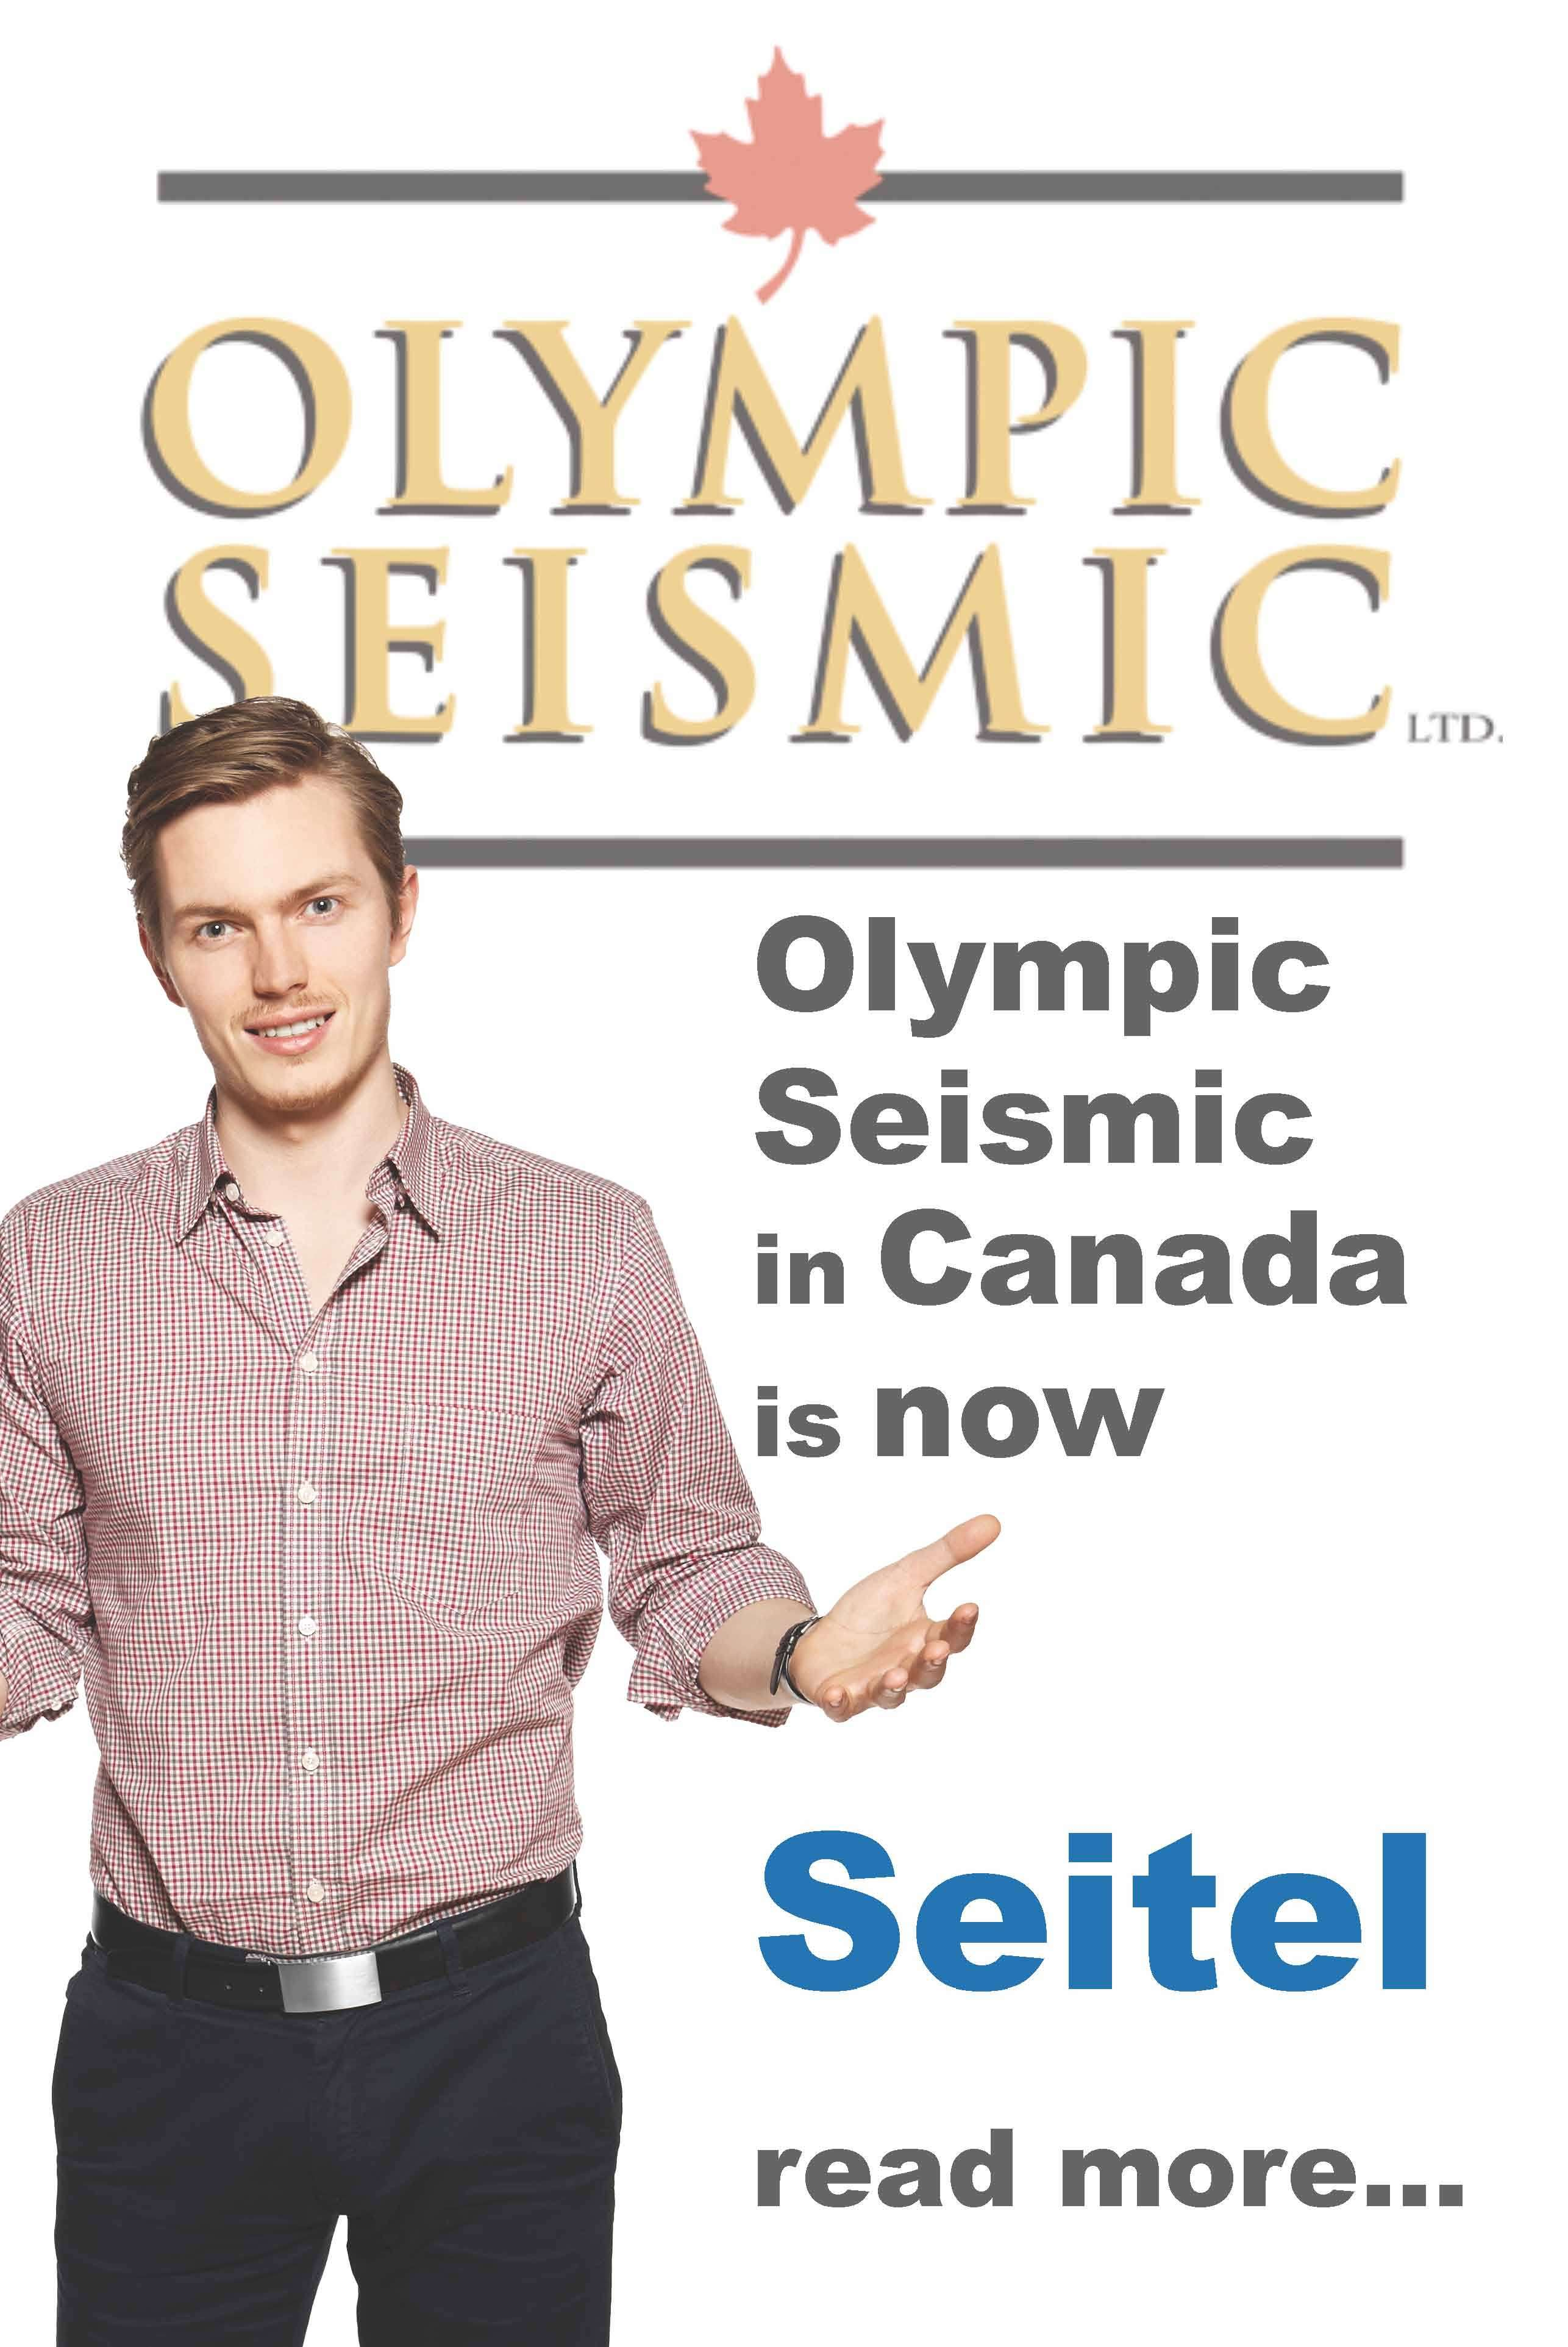 Olympic Seismic Ltd  Announces Company Name Change to Seitel Canada